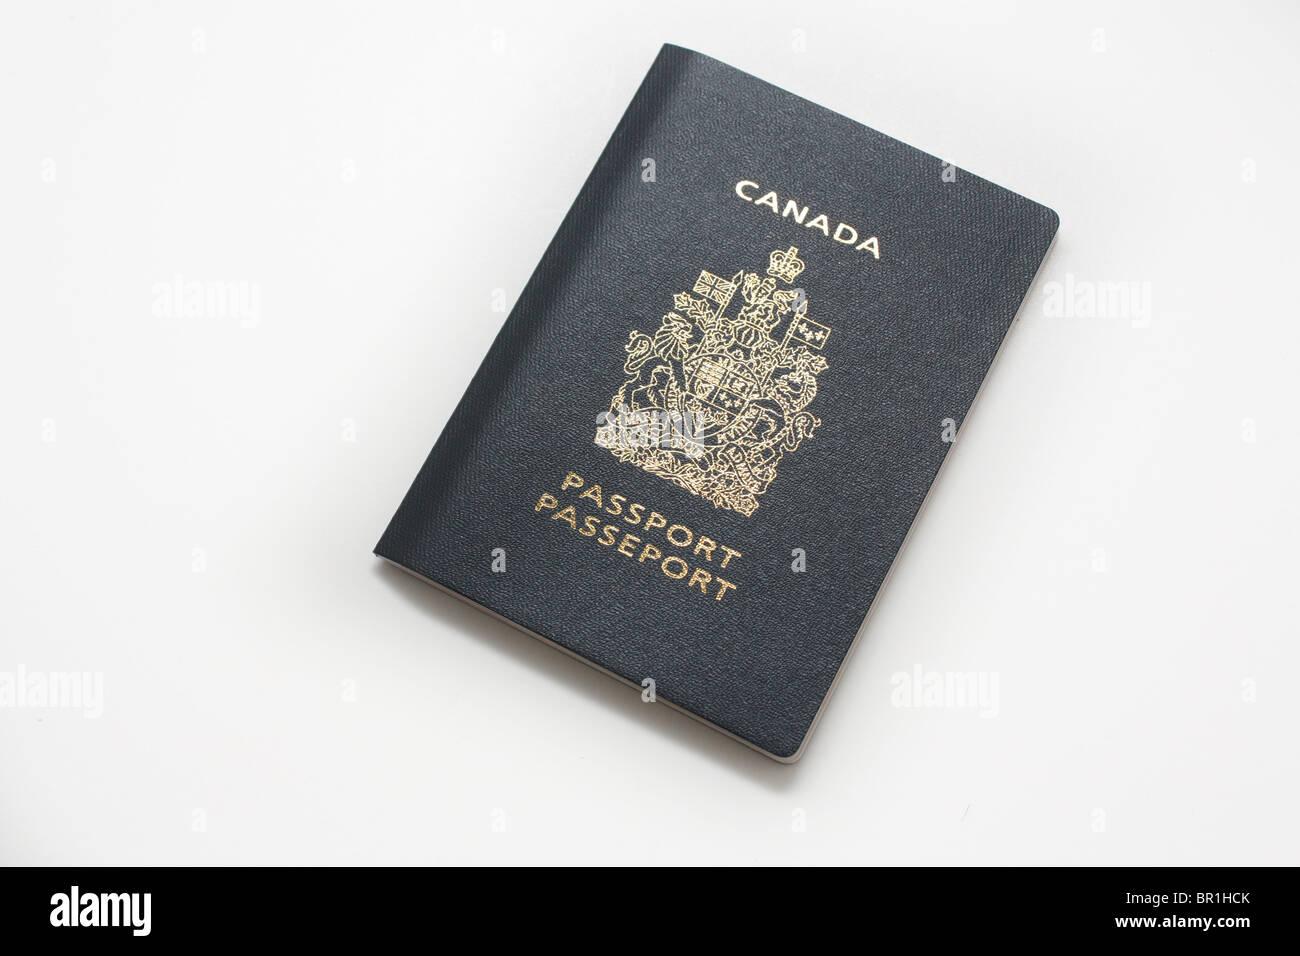 canada canadian passport travel document - Stock Image